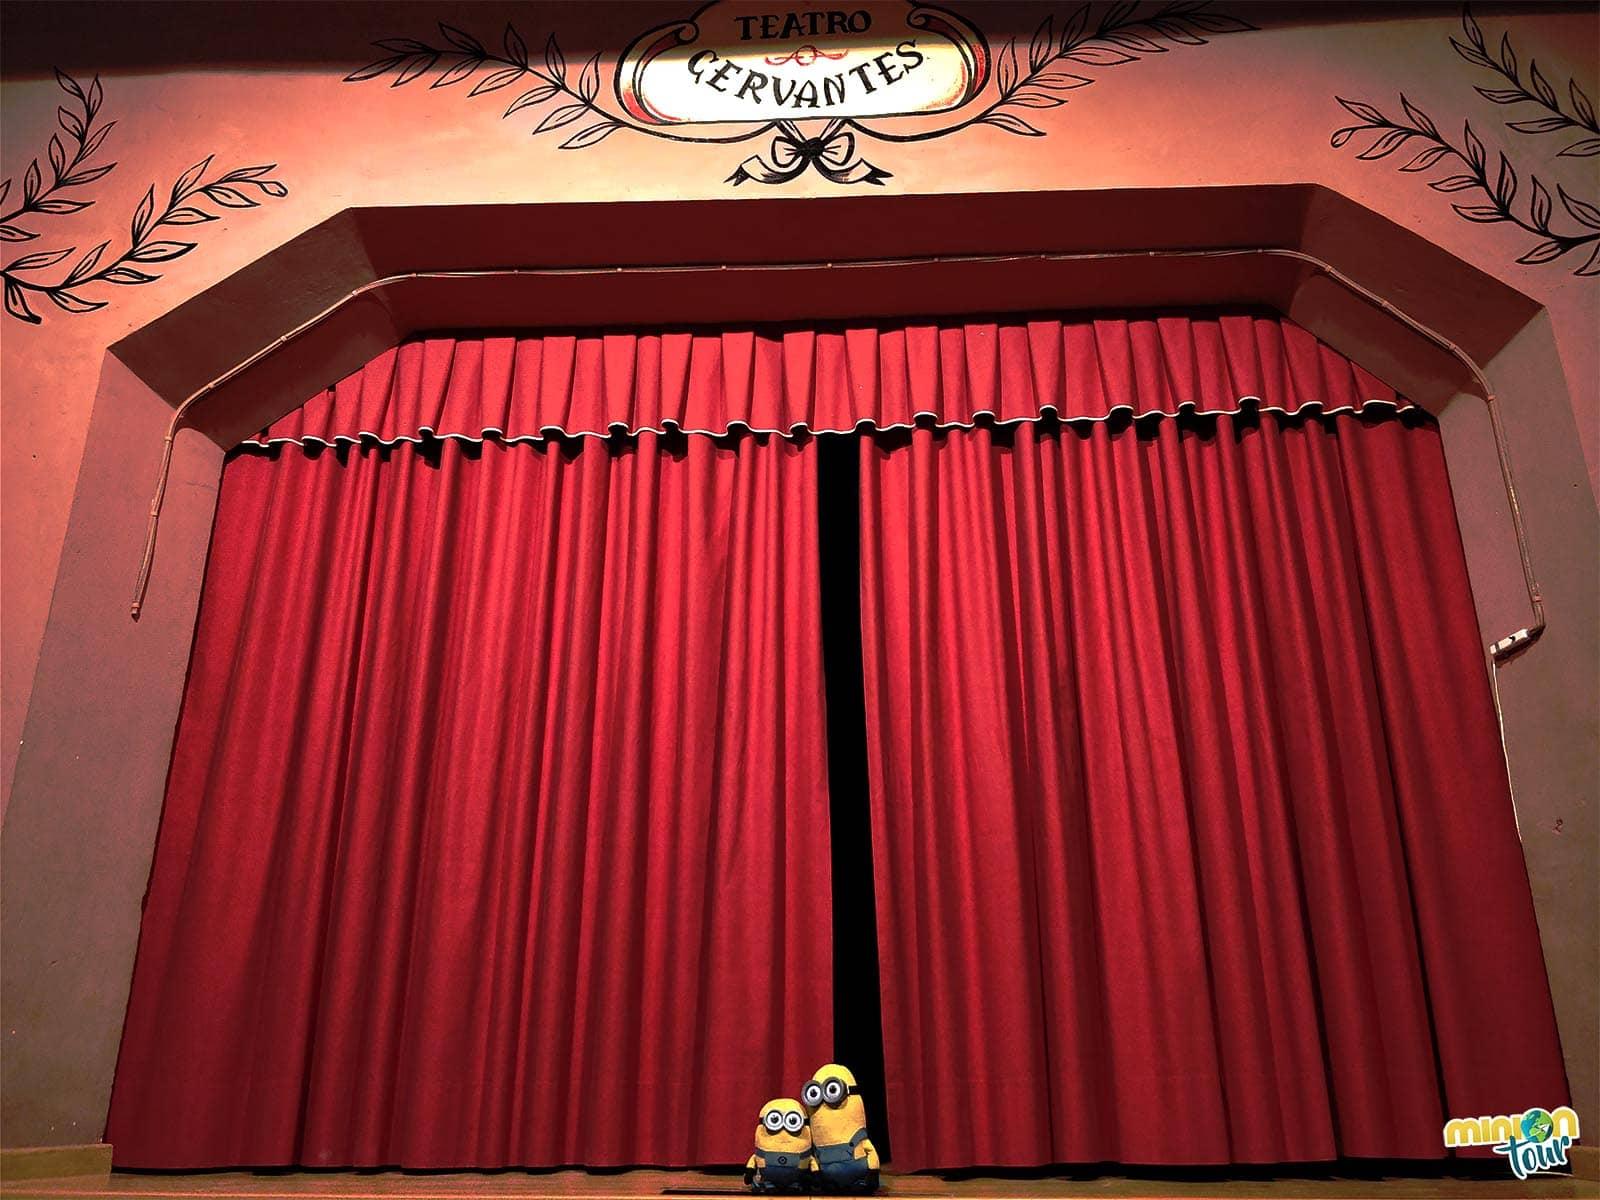 Telón del Teatro Cervantes de Fuensanta